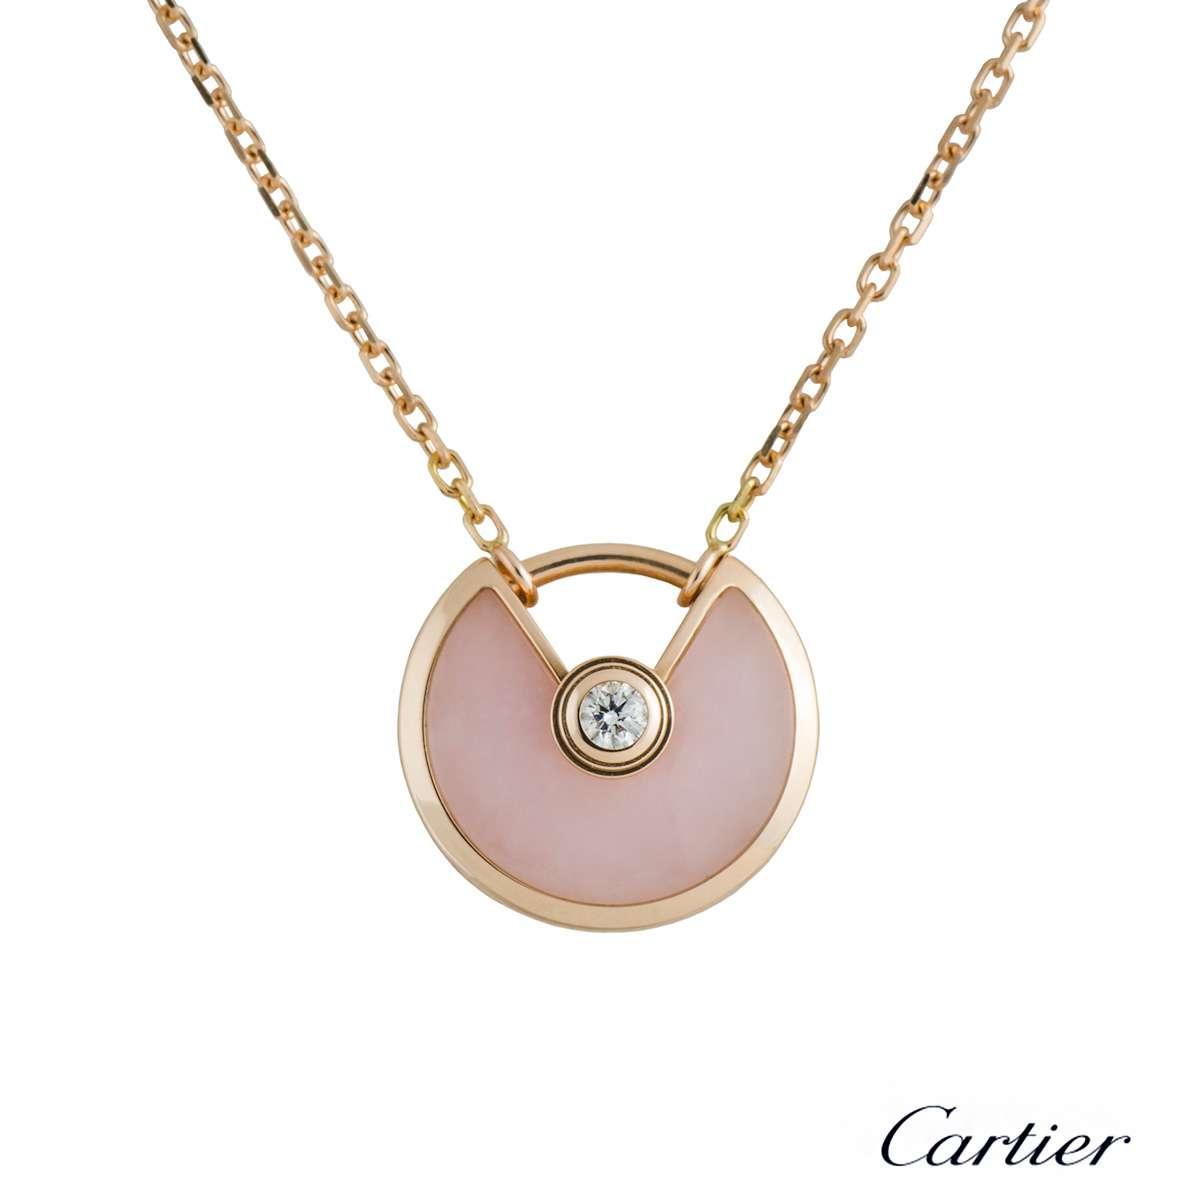 Cartier Amulette de Cartier Rose Gold Diamond & Opal Necklace B7224519 - Rich Diamonds Of Bond ...